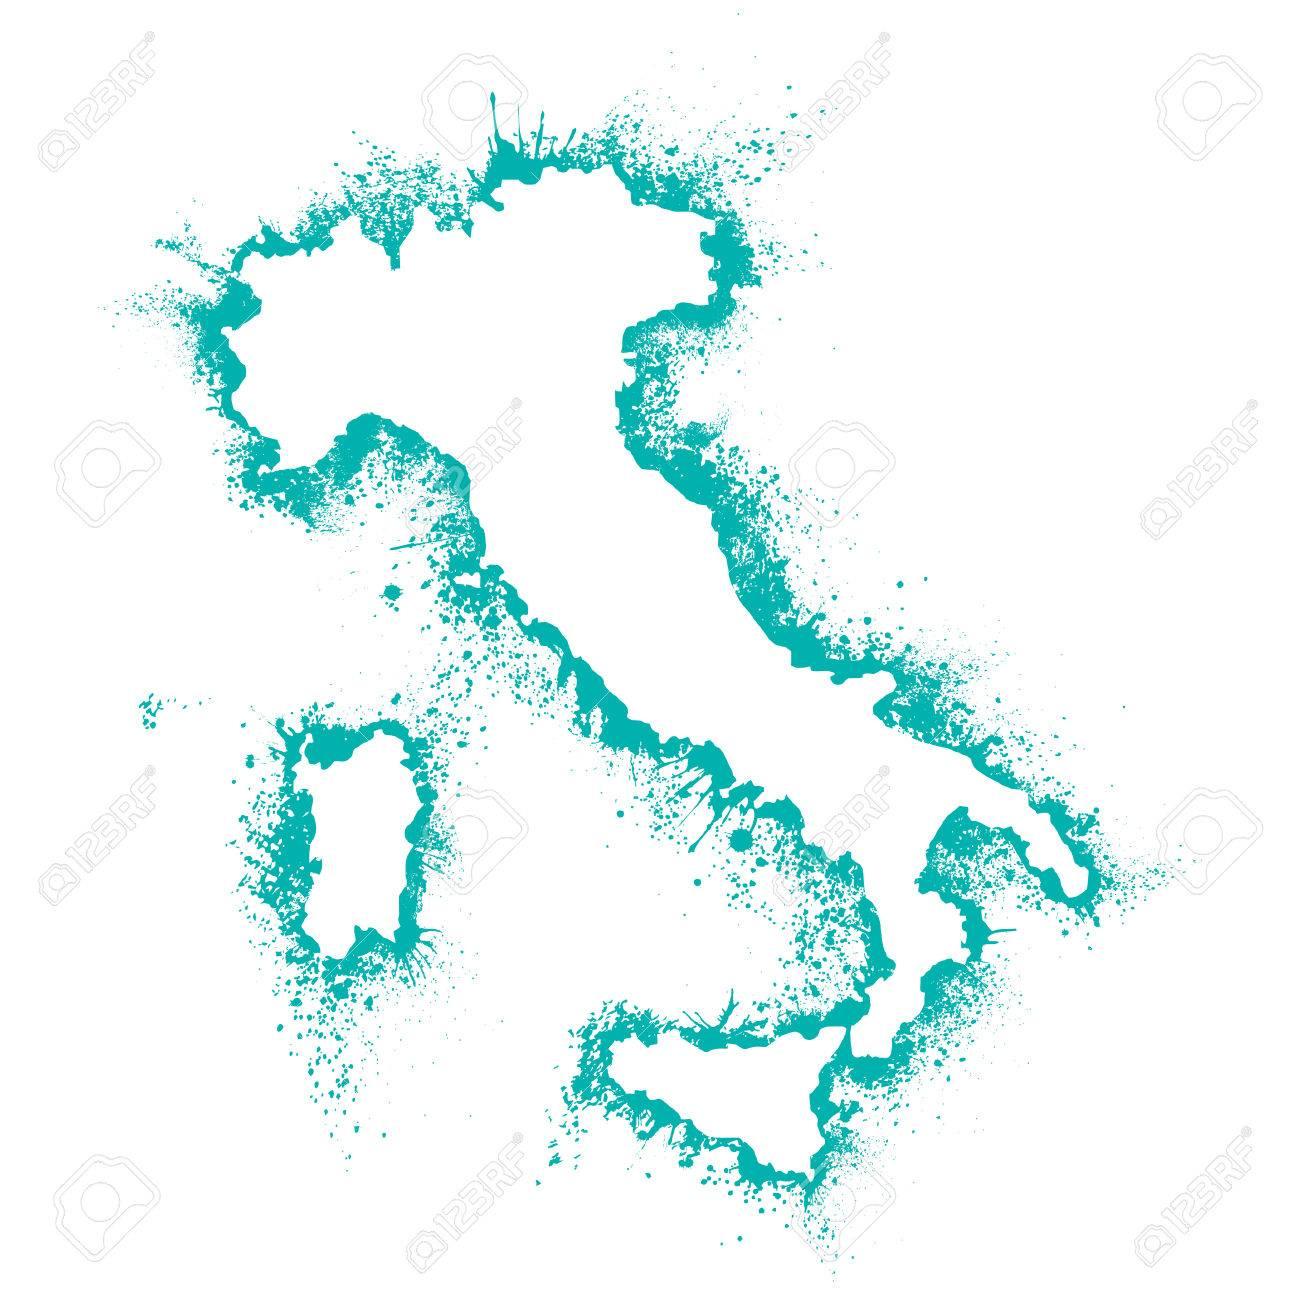 umriss italien karte Italien Karte Im Vektor Format In Der Sprühfarbe, Farbflecken